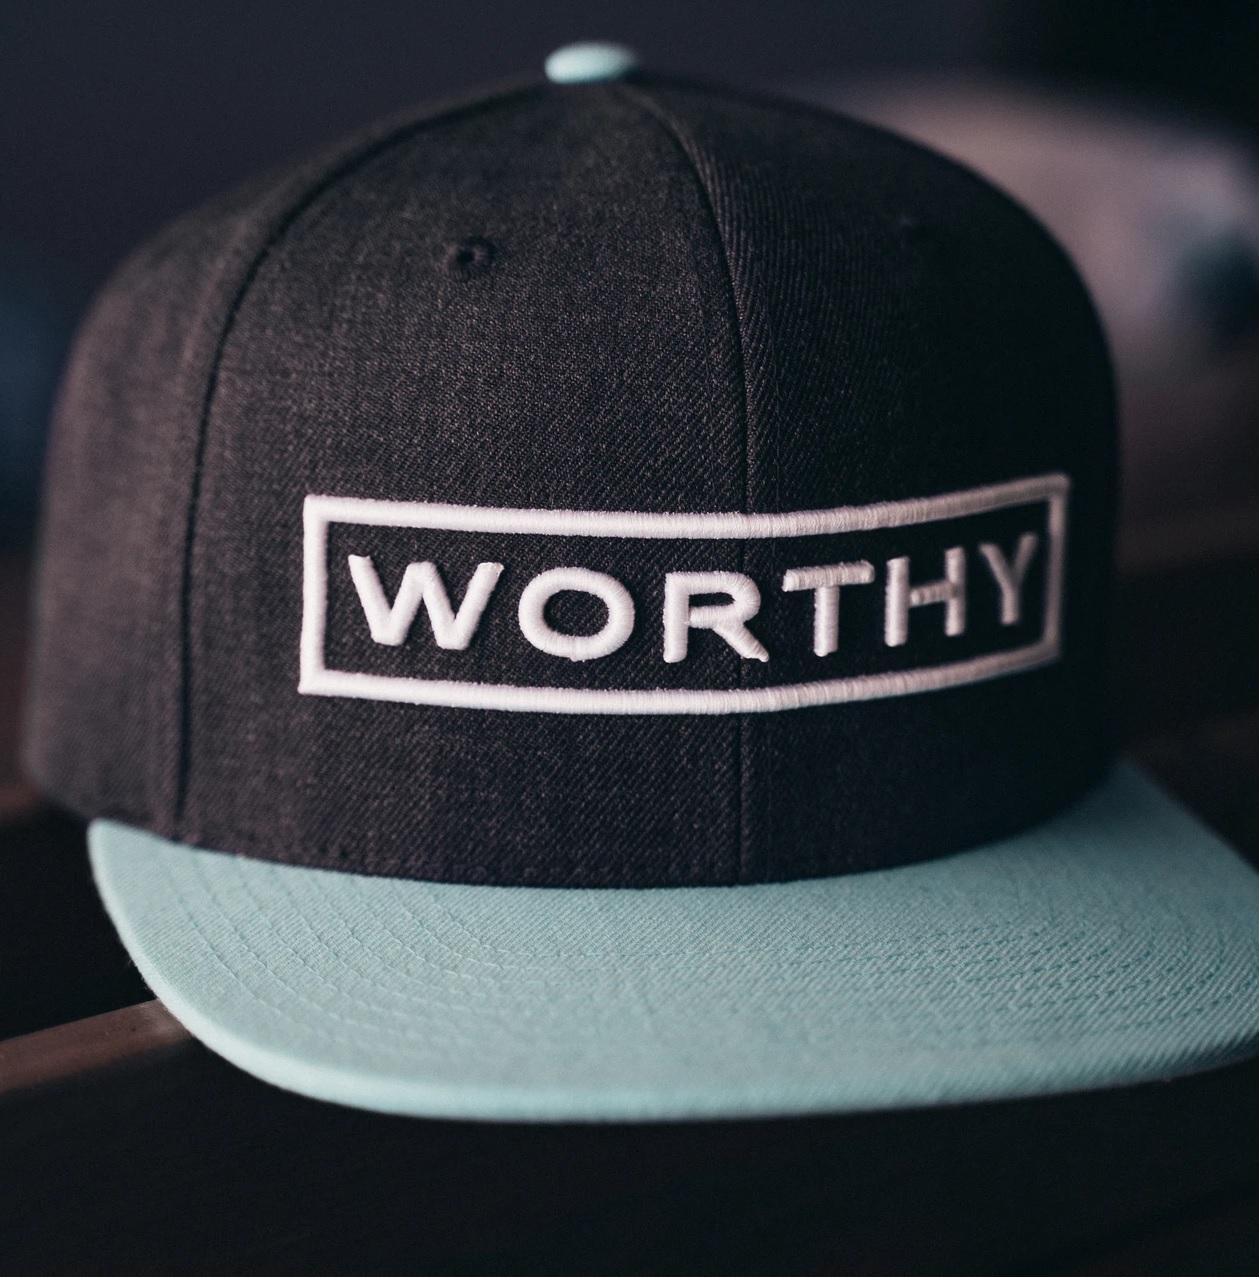 Buat Komunitas Anda Lebih Menarik dengan Topi Custom Keren